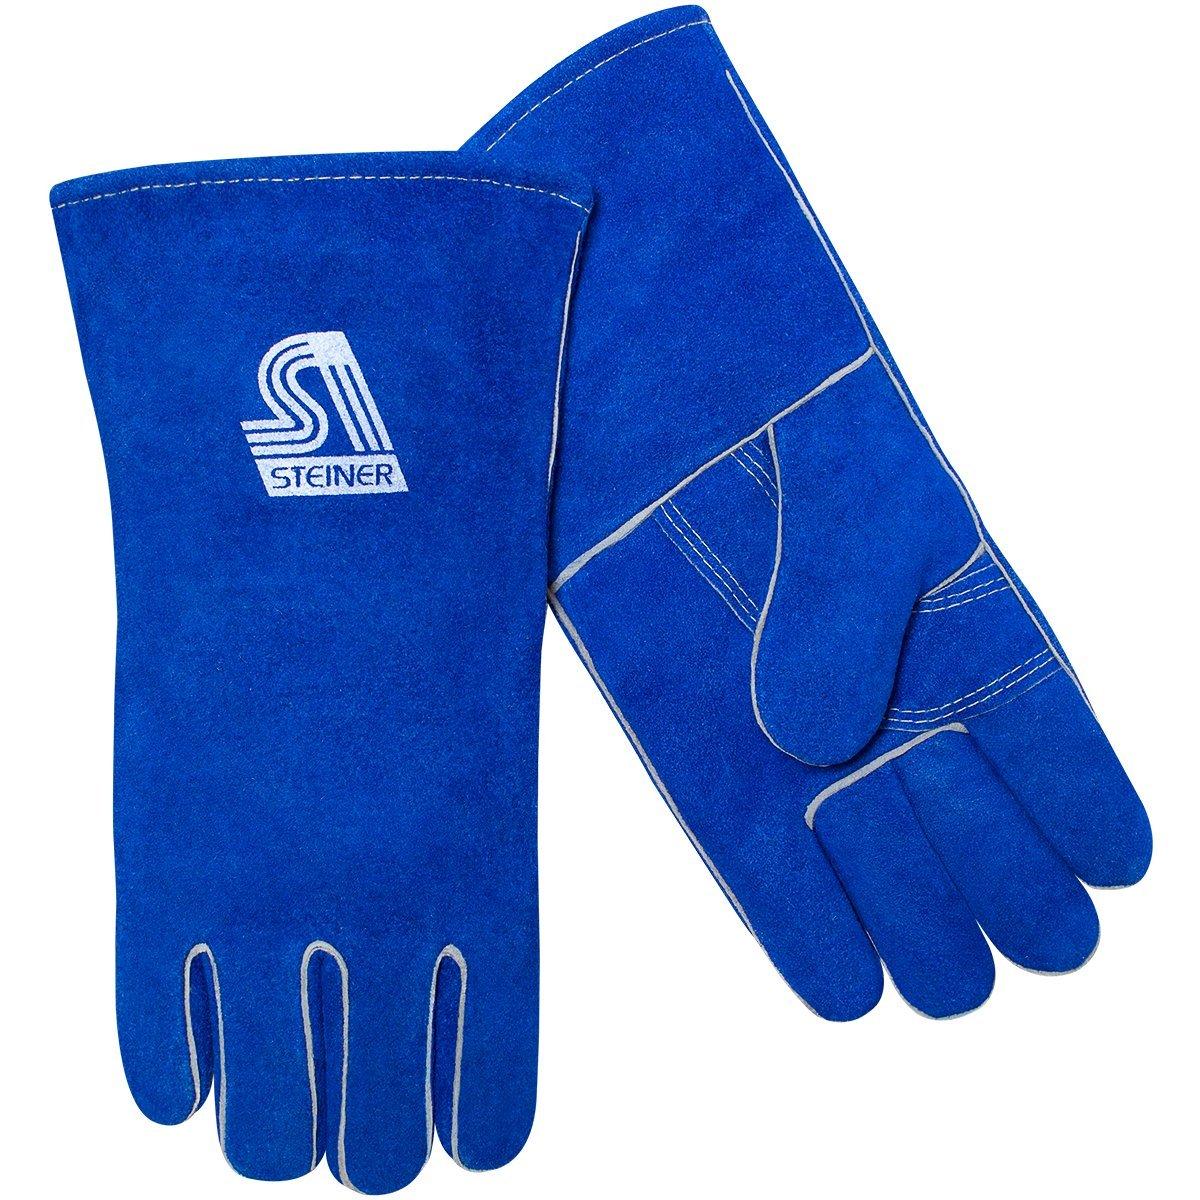 Steiner 02509F-M ThermoCore Foam Lined Shoulder Split Cowhide Stick Welding Gloves Medium Blue